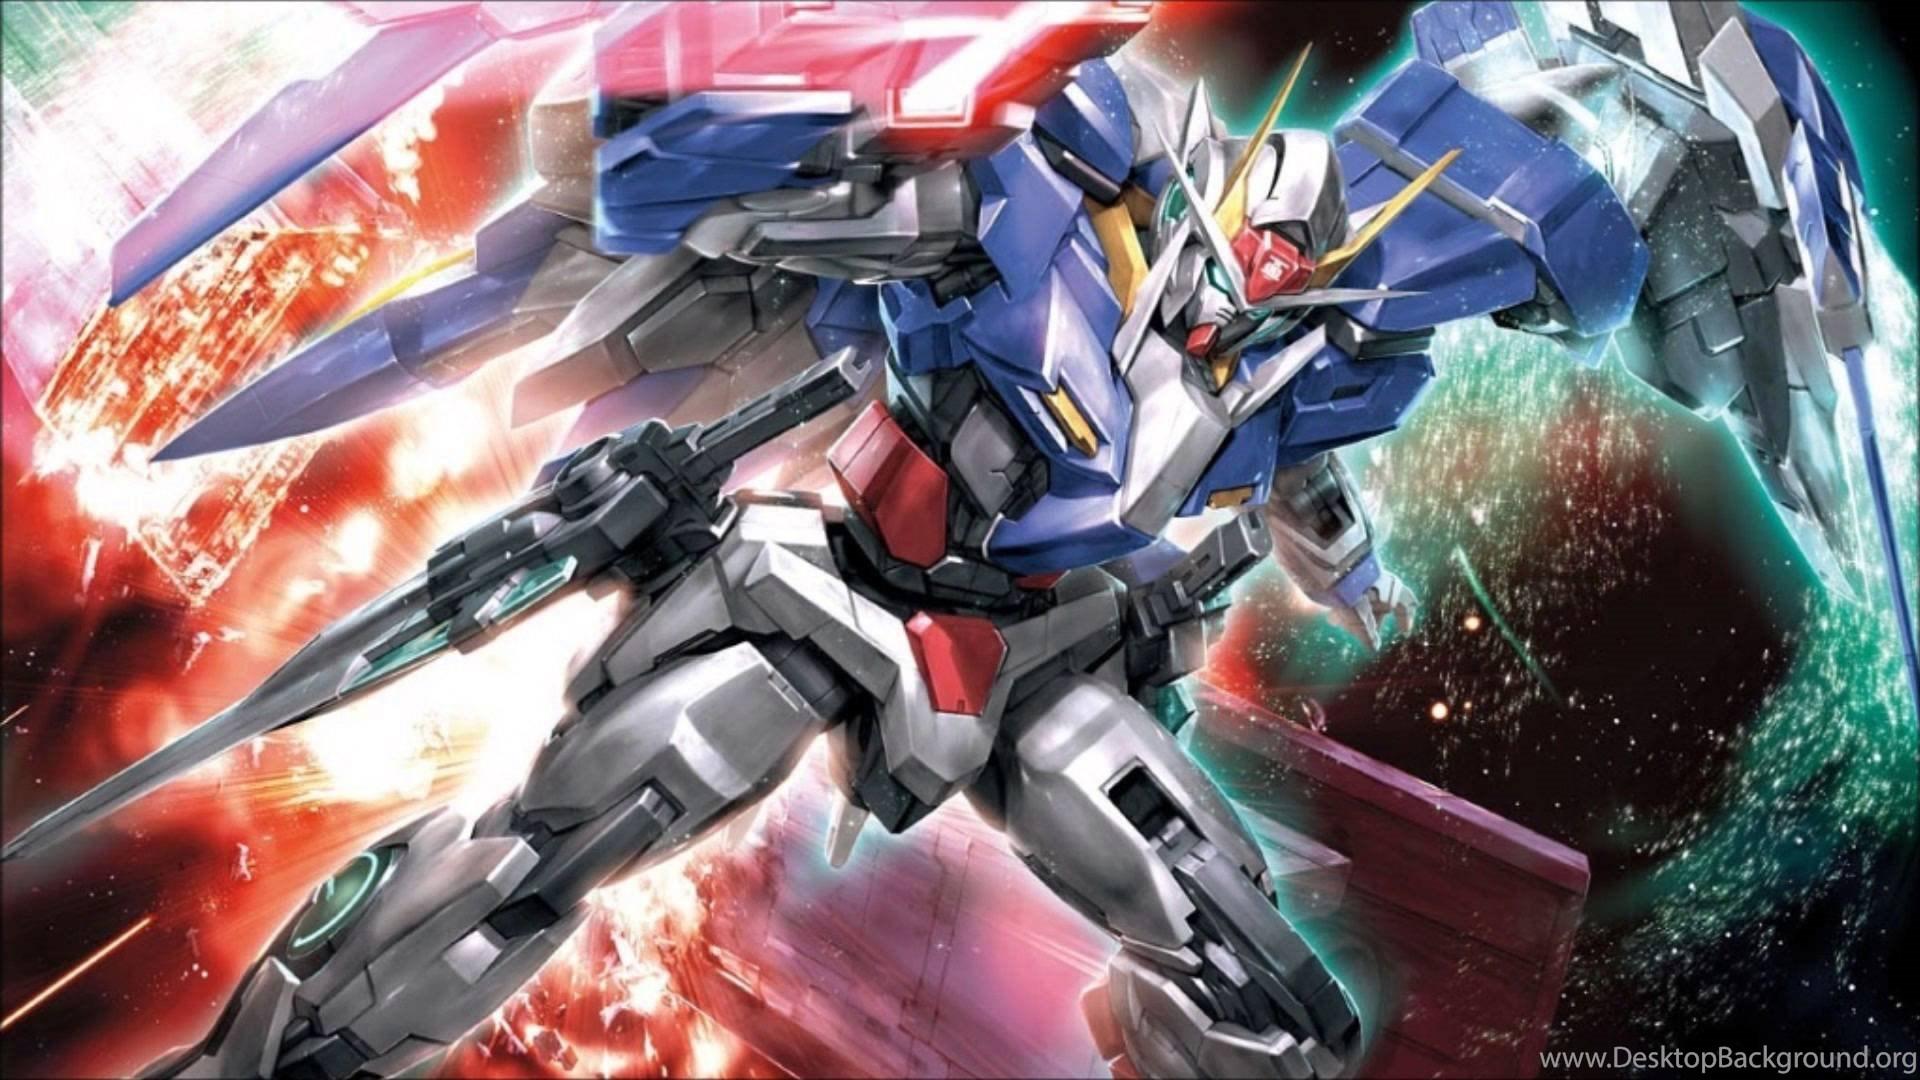 Gundam 00 Wallpapers Wallpapers Cave Desktop Background